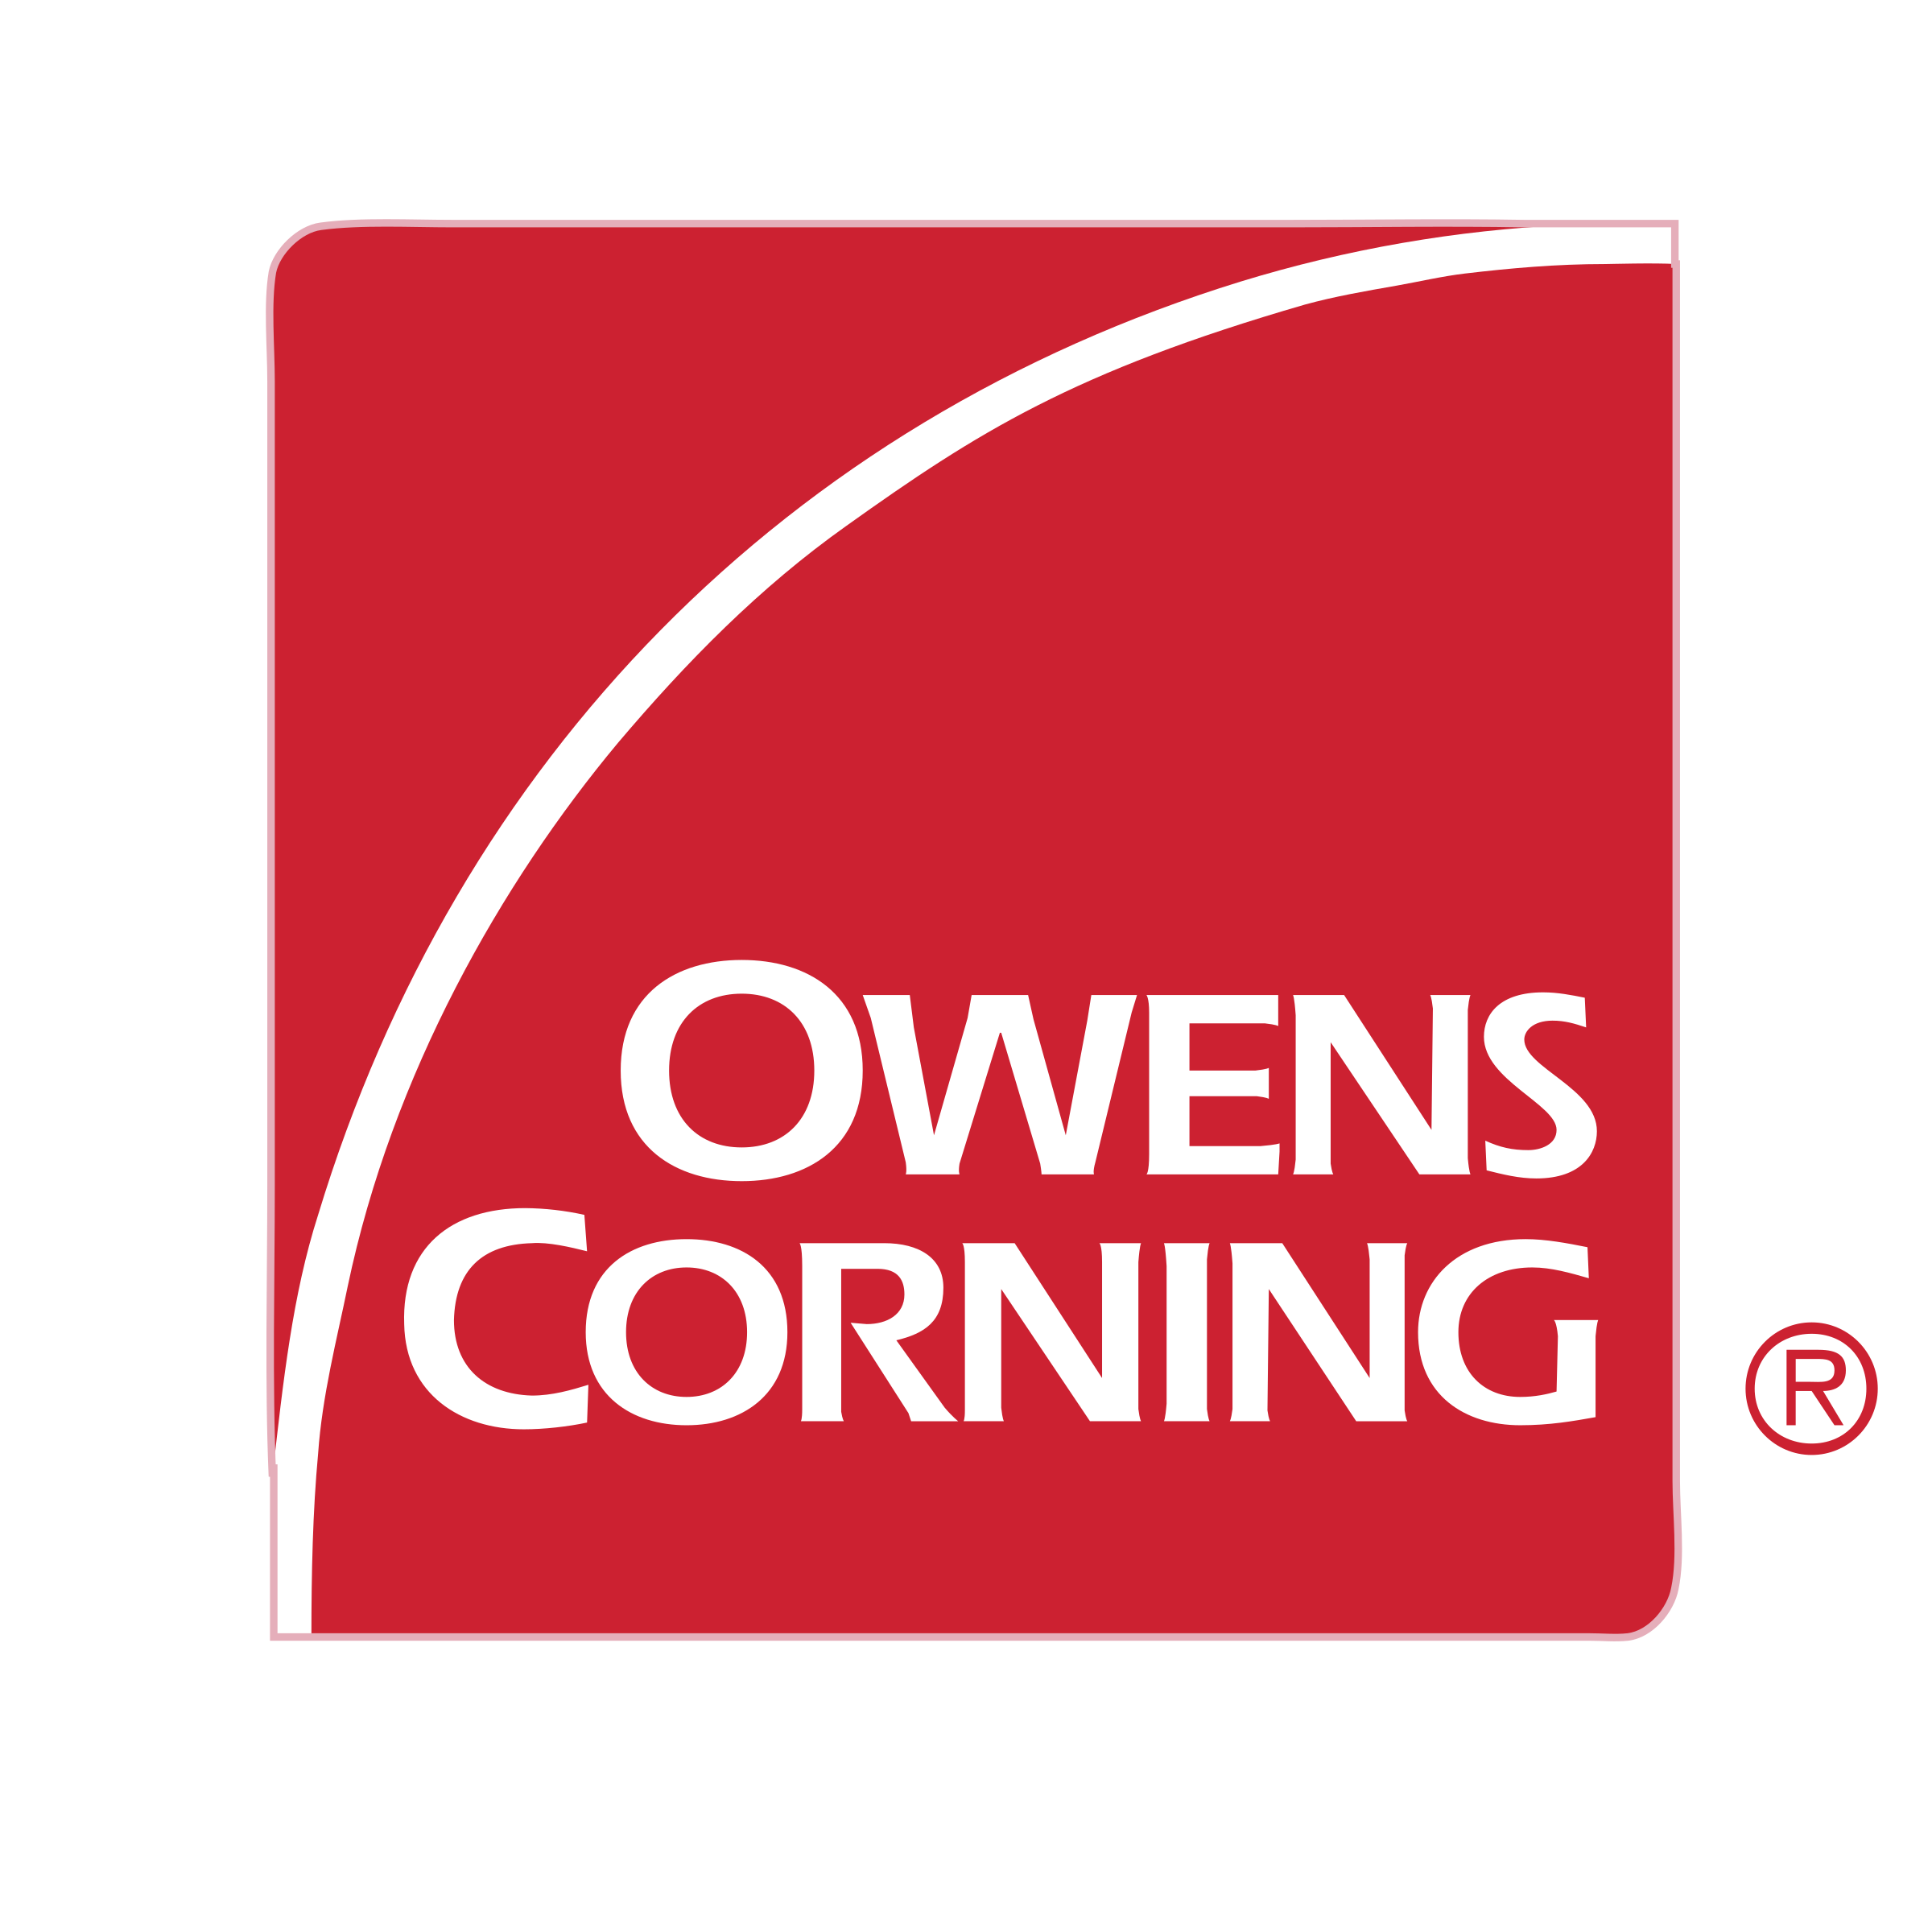 owens-corning Logo